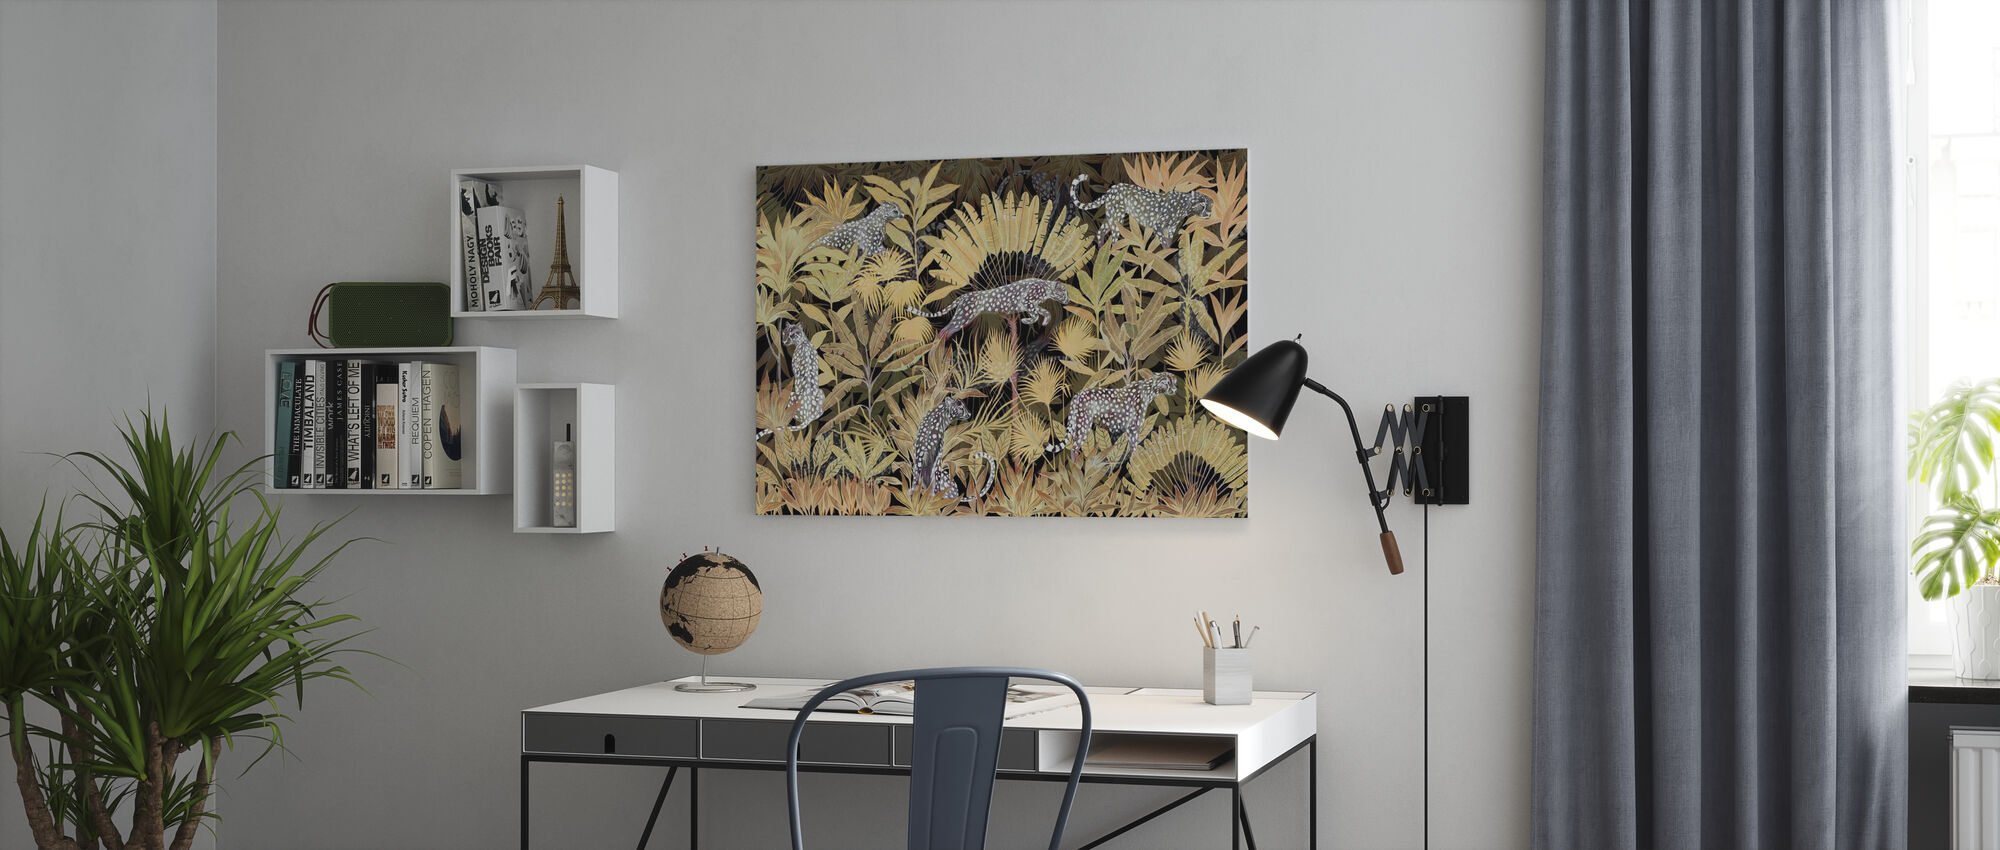 Lurking Cheetahs - Midnight - Canvas print - Office